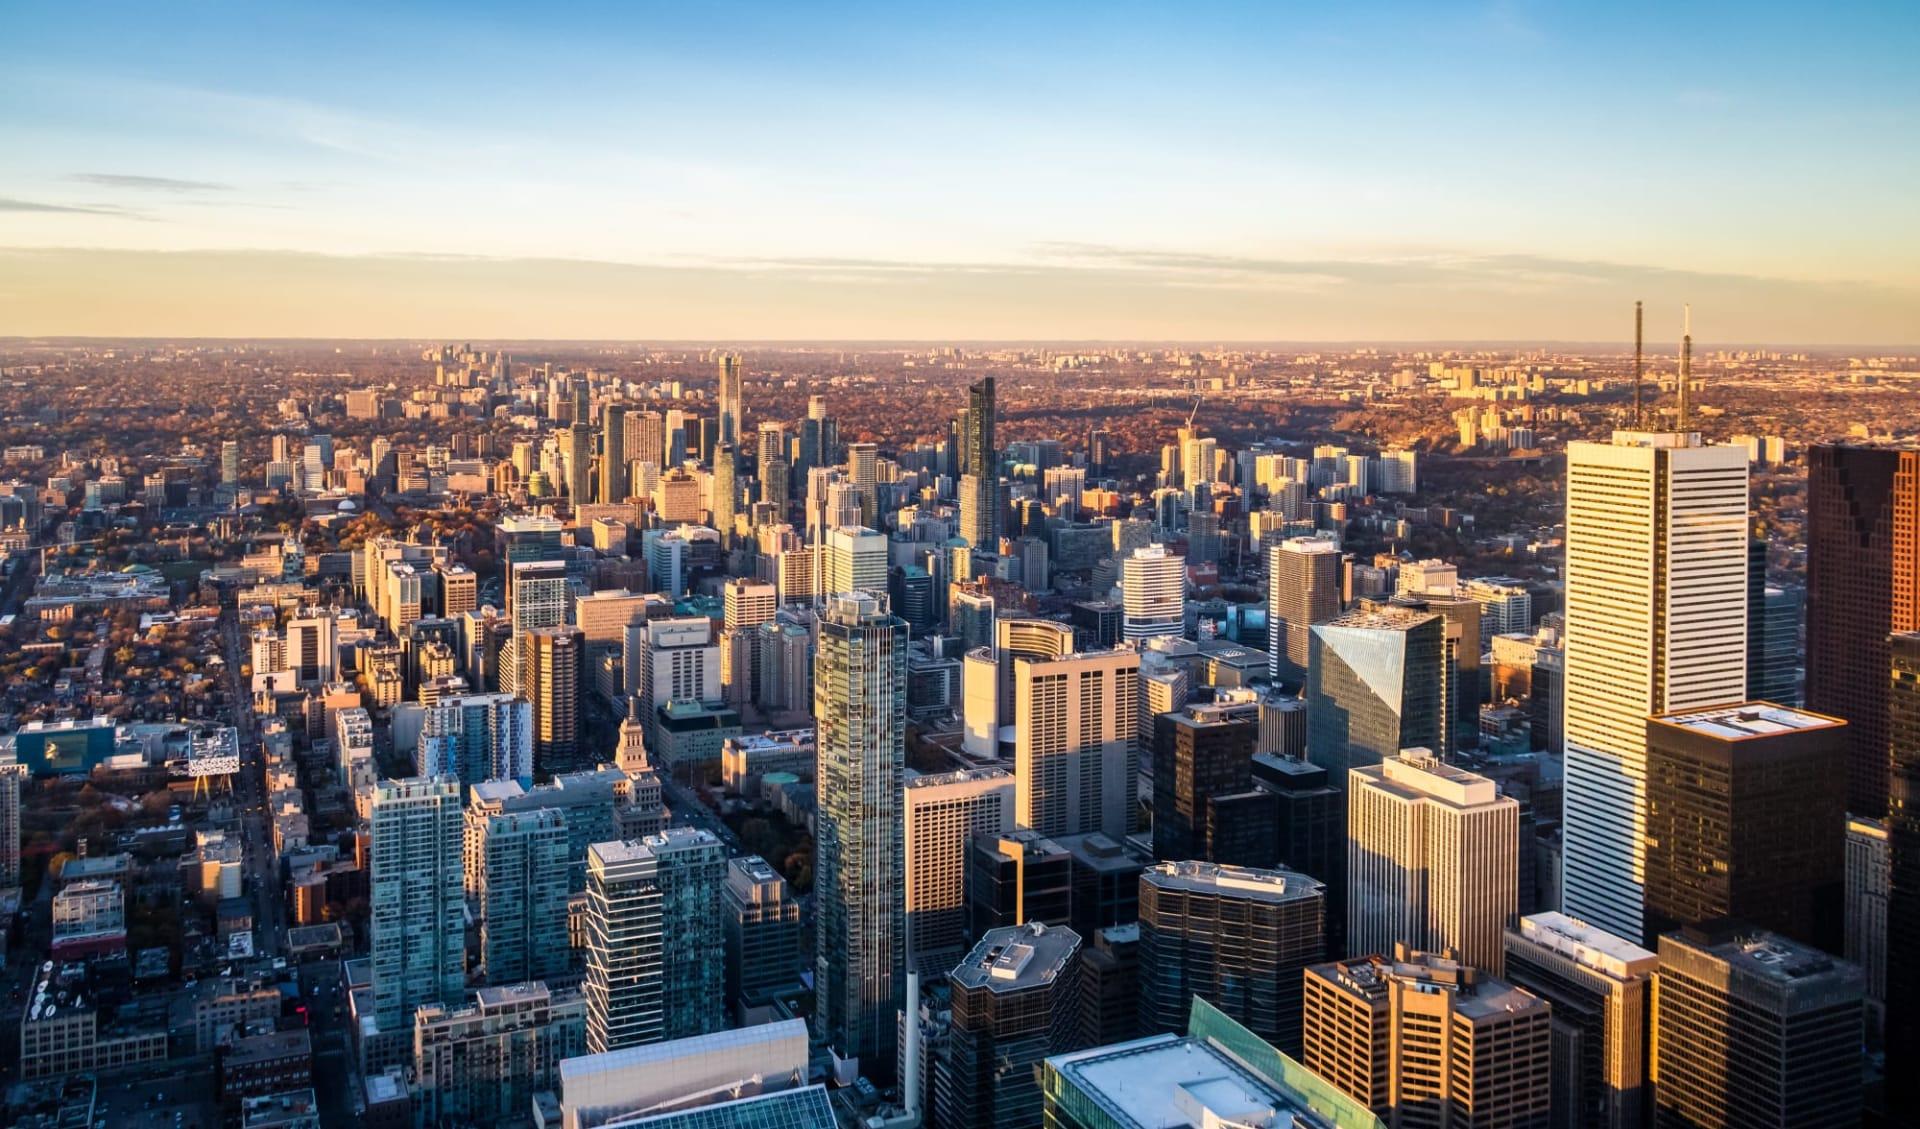 Geführte Bahnerlebnisreise - Goldener Ahorn ab Toronto: Toronto